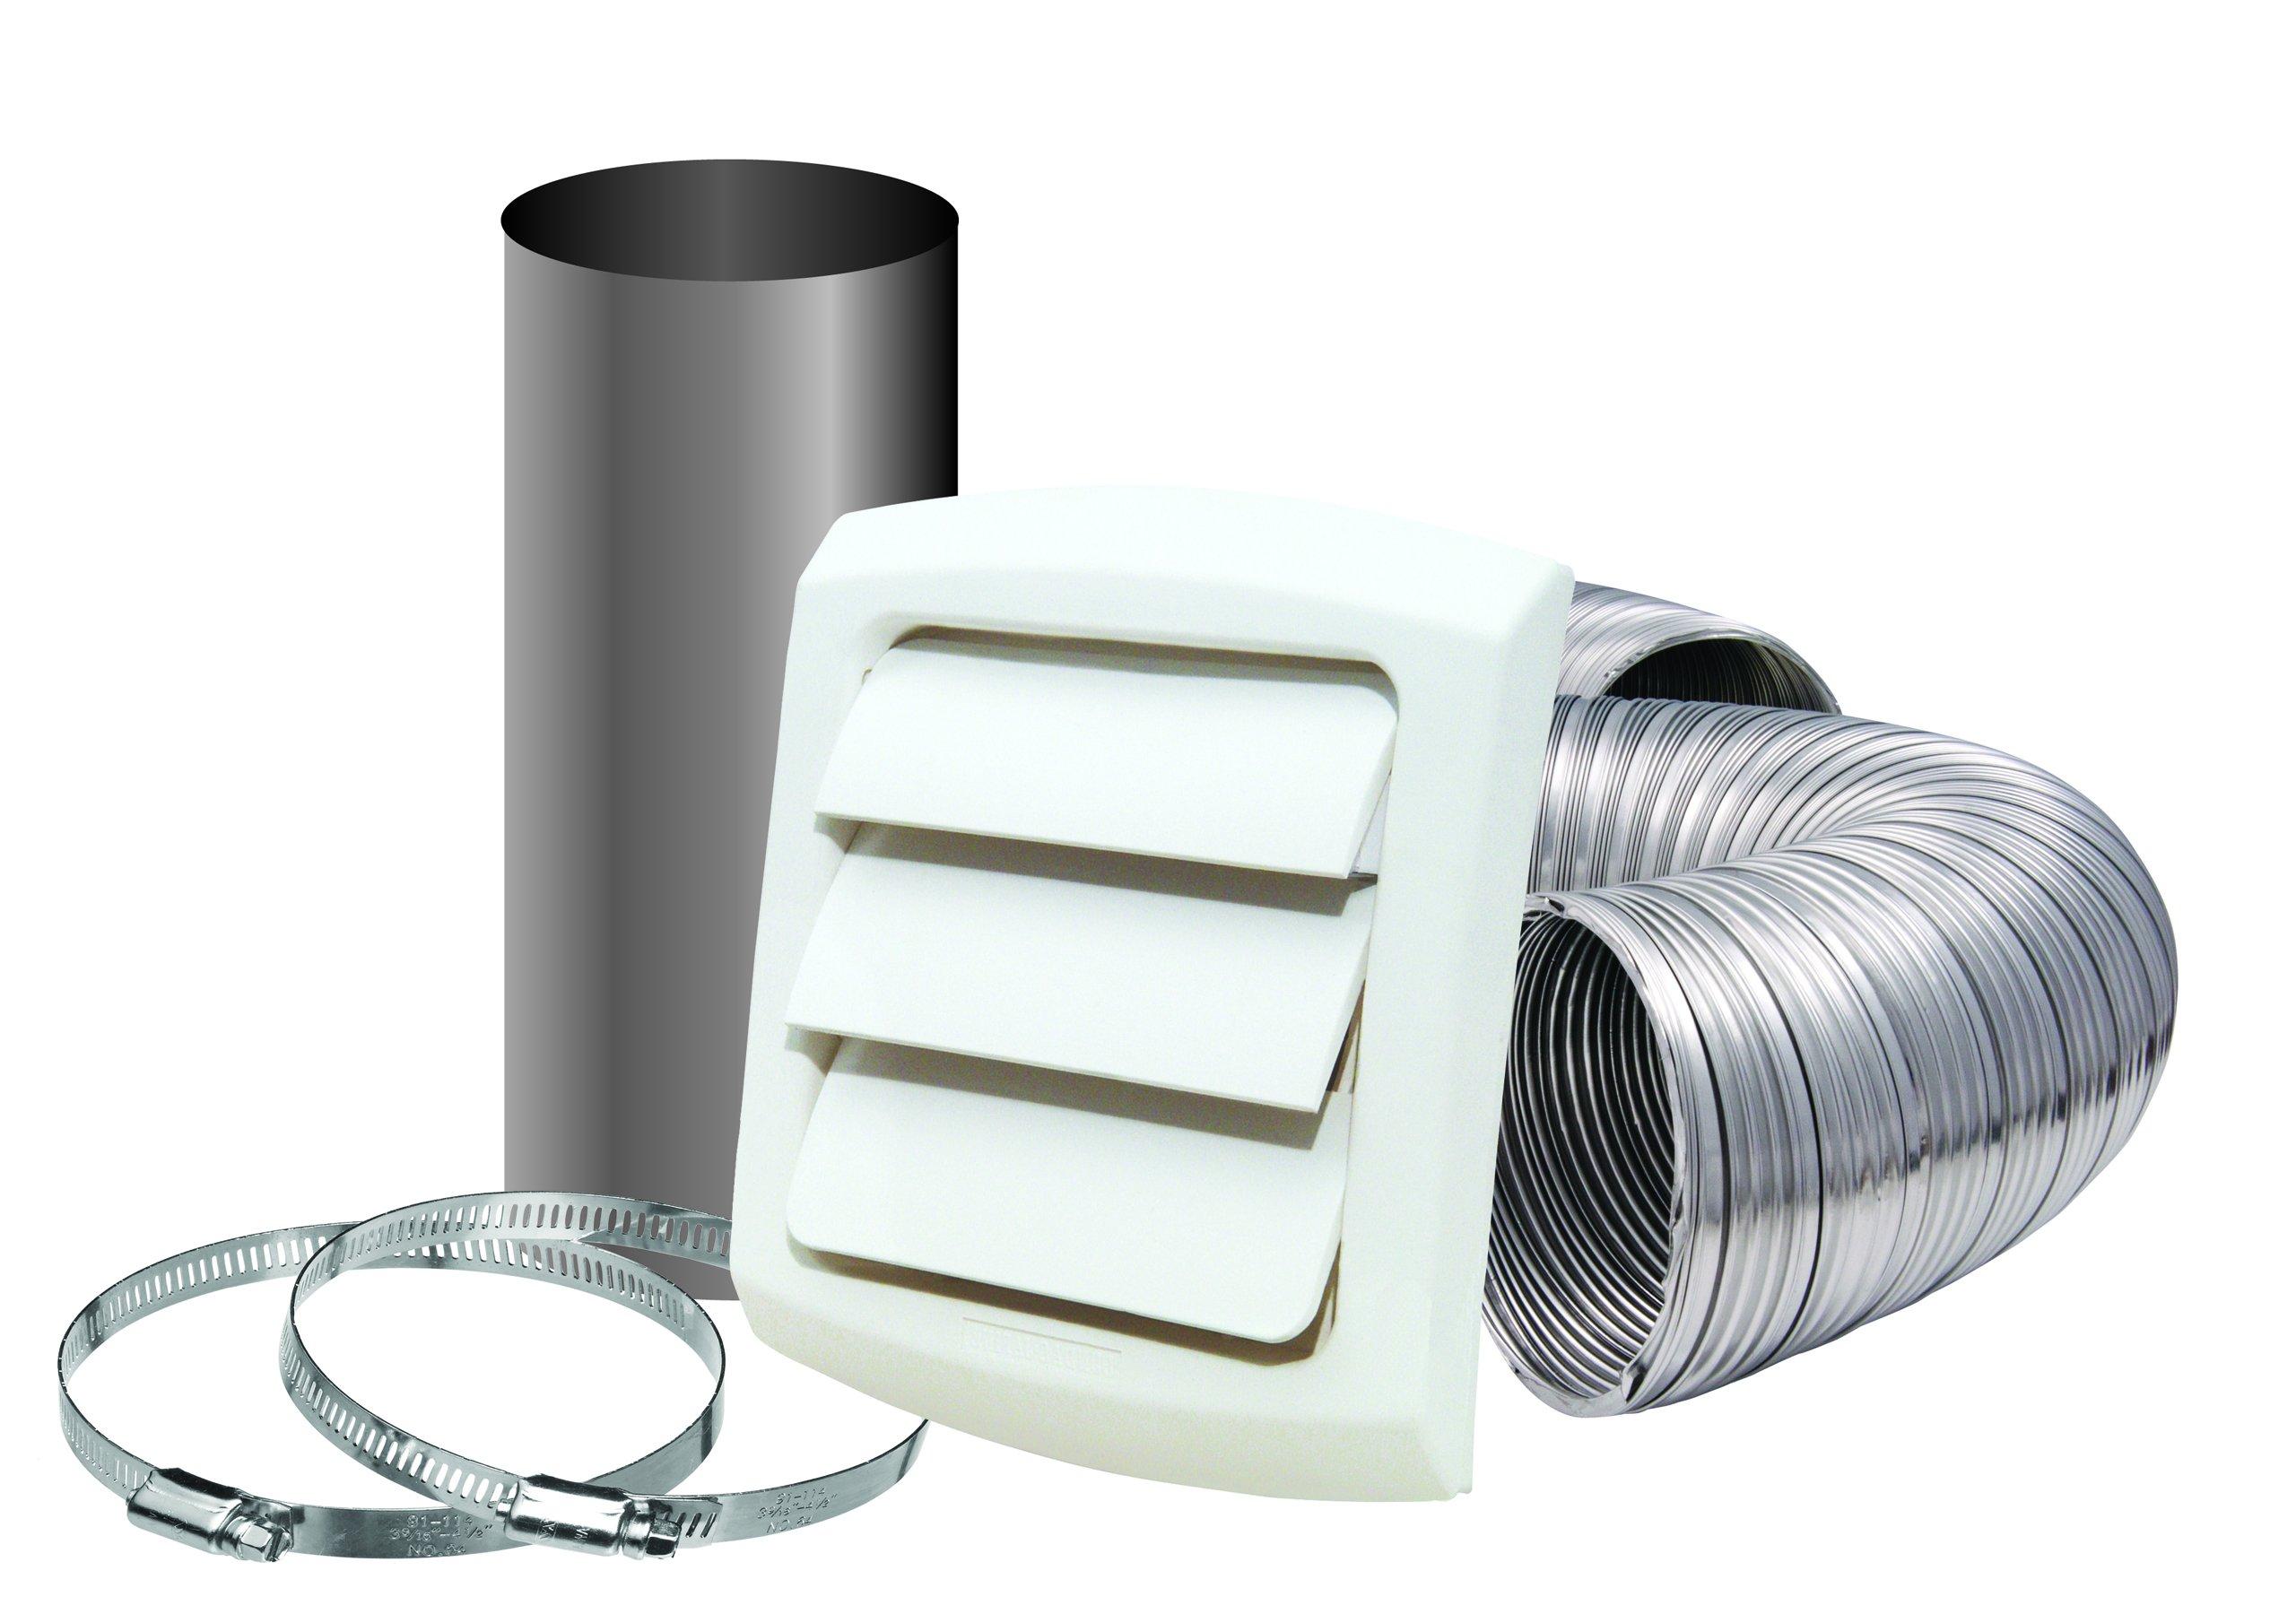 Dundas Jafine MLFVK48E Semi-Rigid Aluminum Dryer Vent Kit